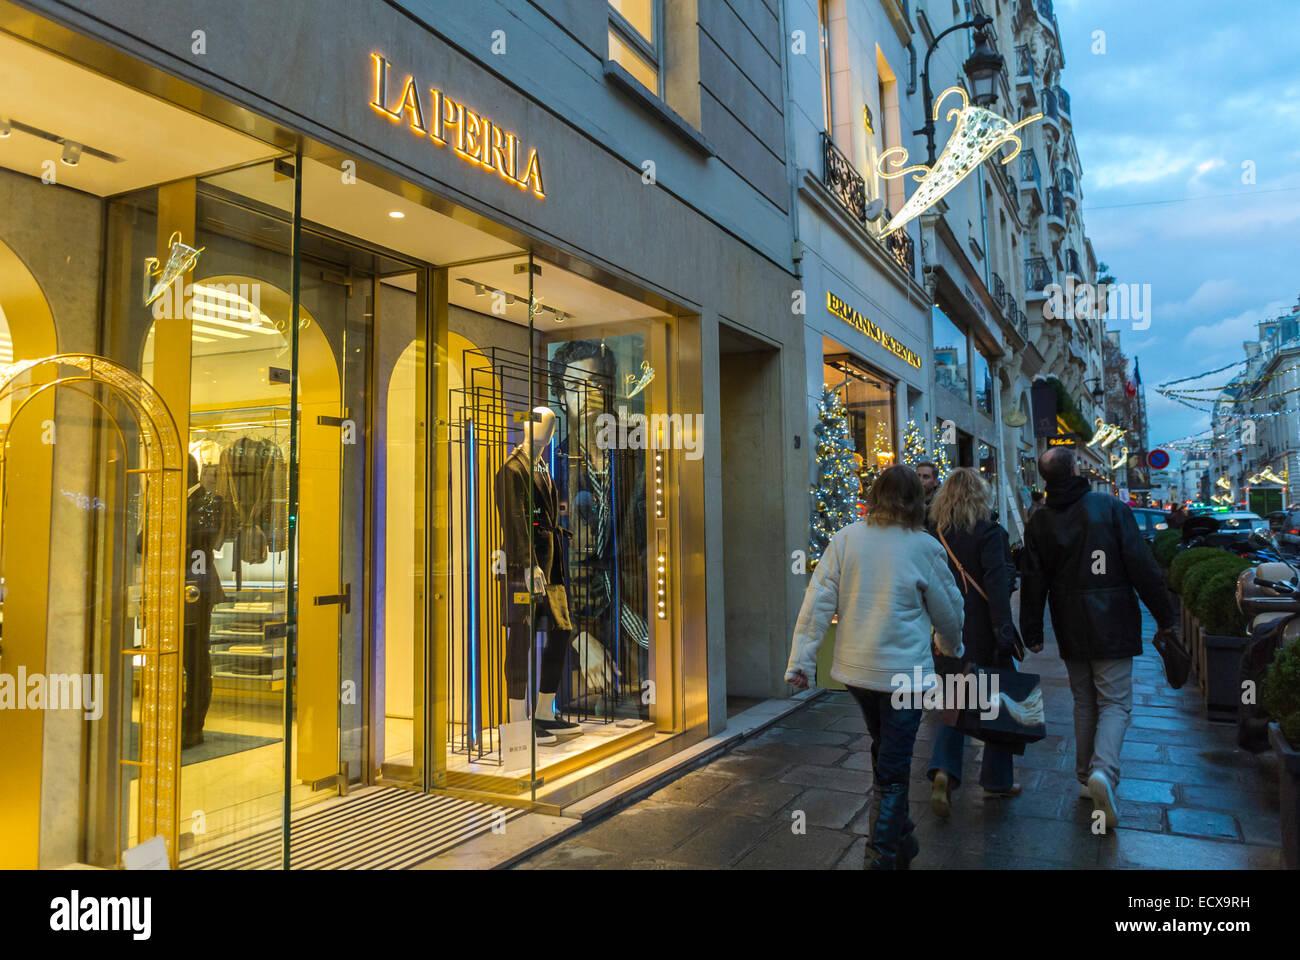 paris  france  people walking  christmas shopping  outside street stock photo  royalty free